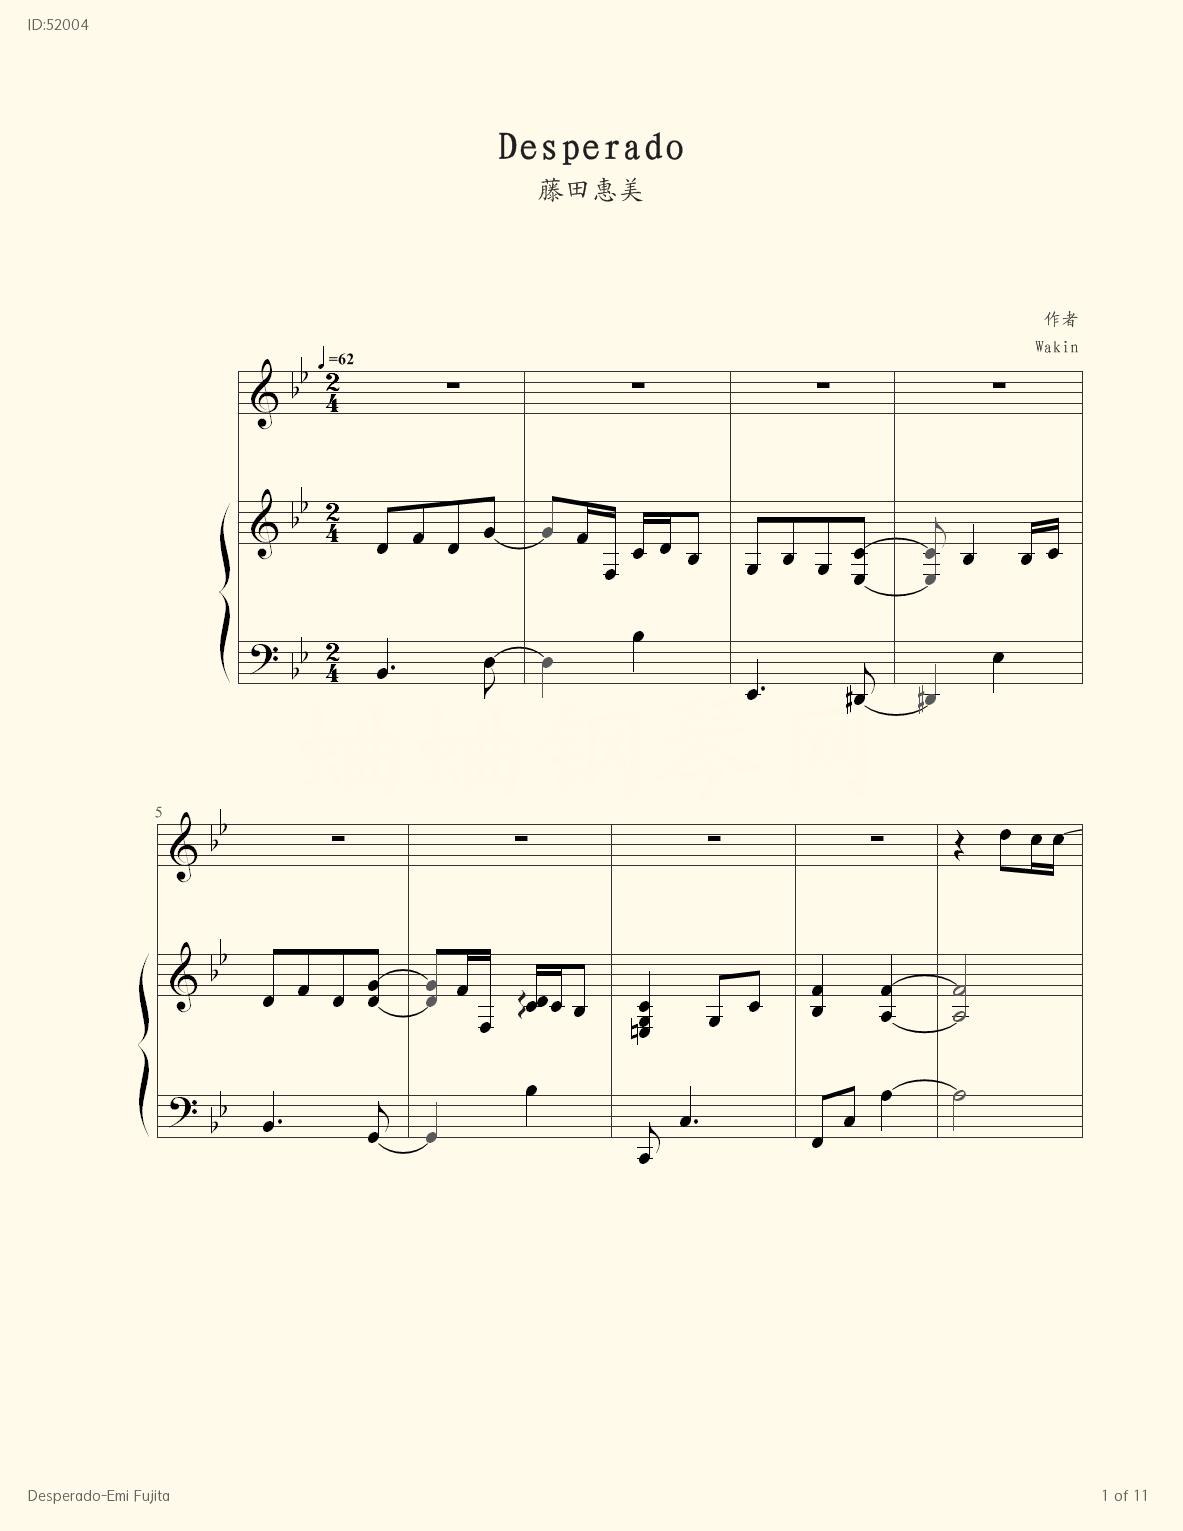 Desperado Emi Fujita - Emi Fujita - first page